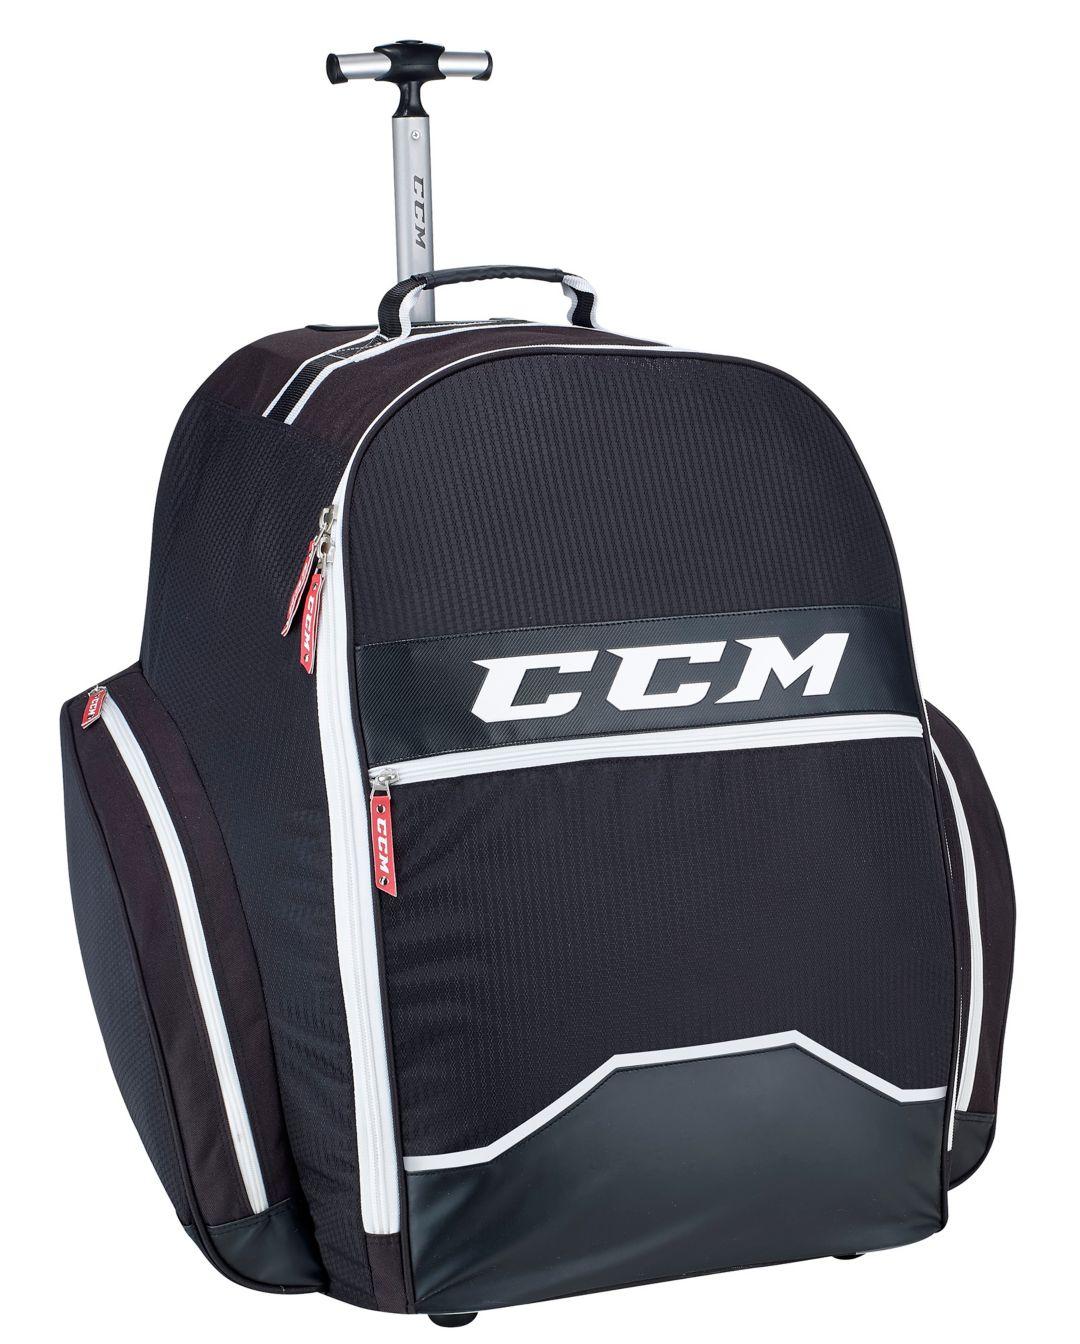 Ccm 390 Player Wheeled Hockey Backpack